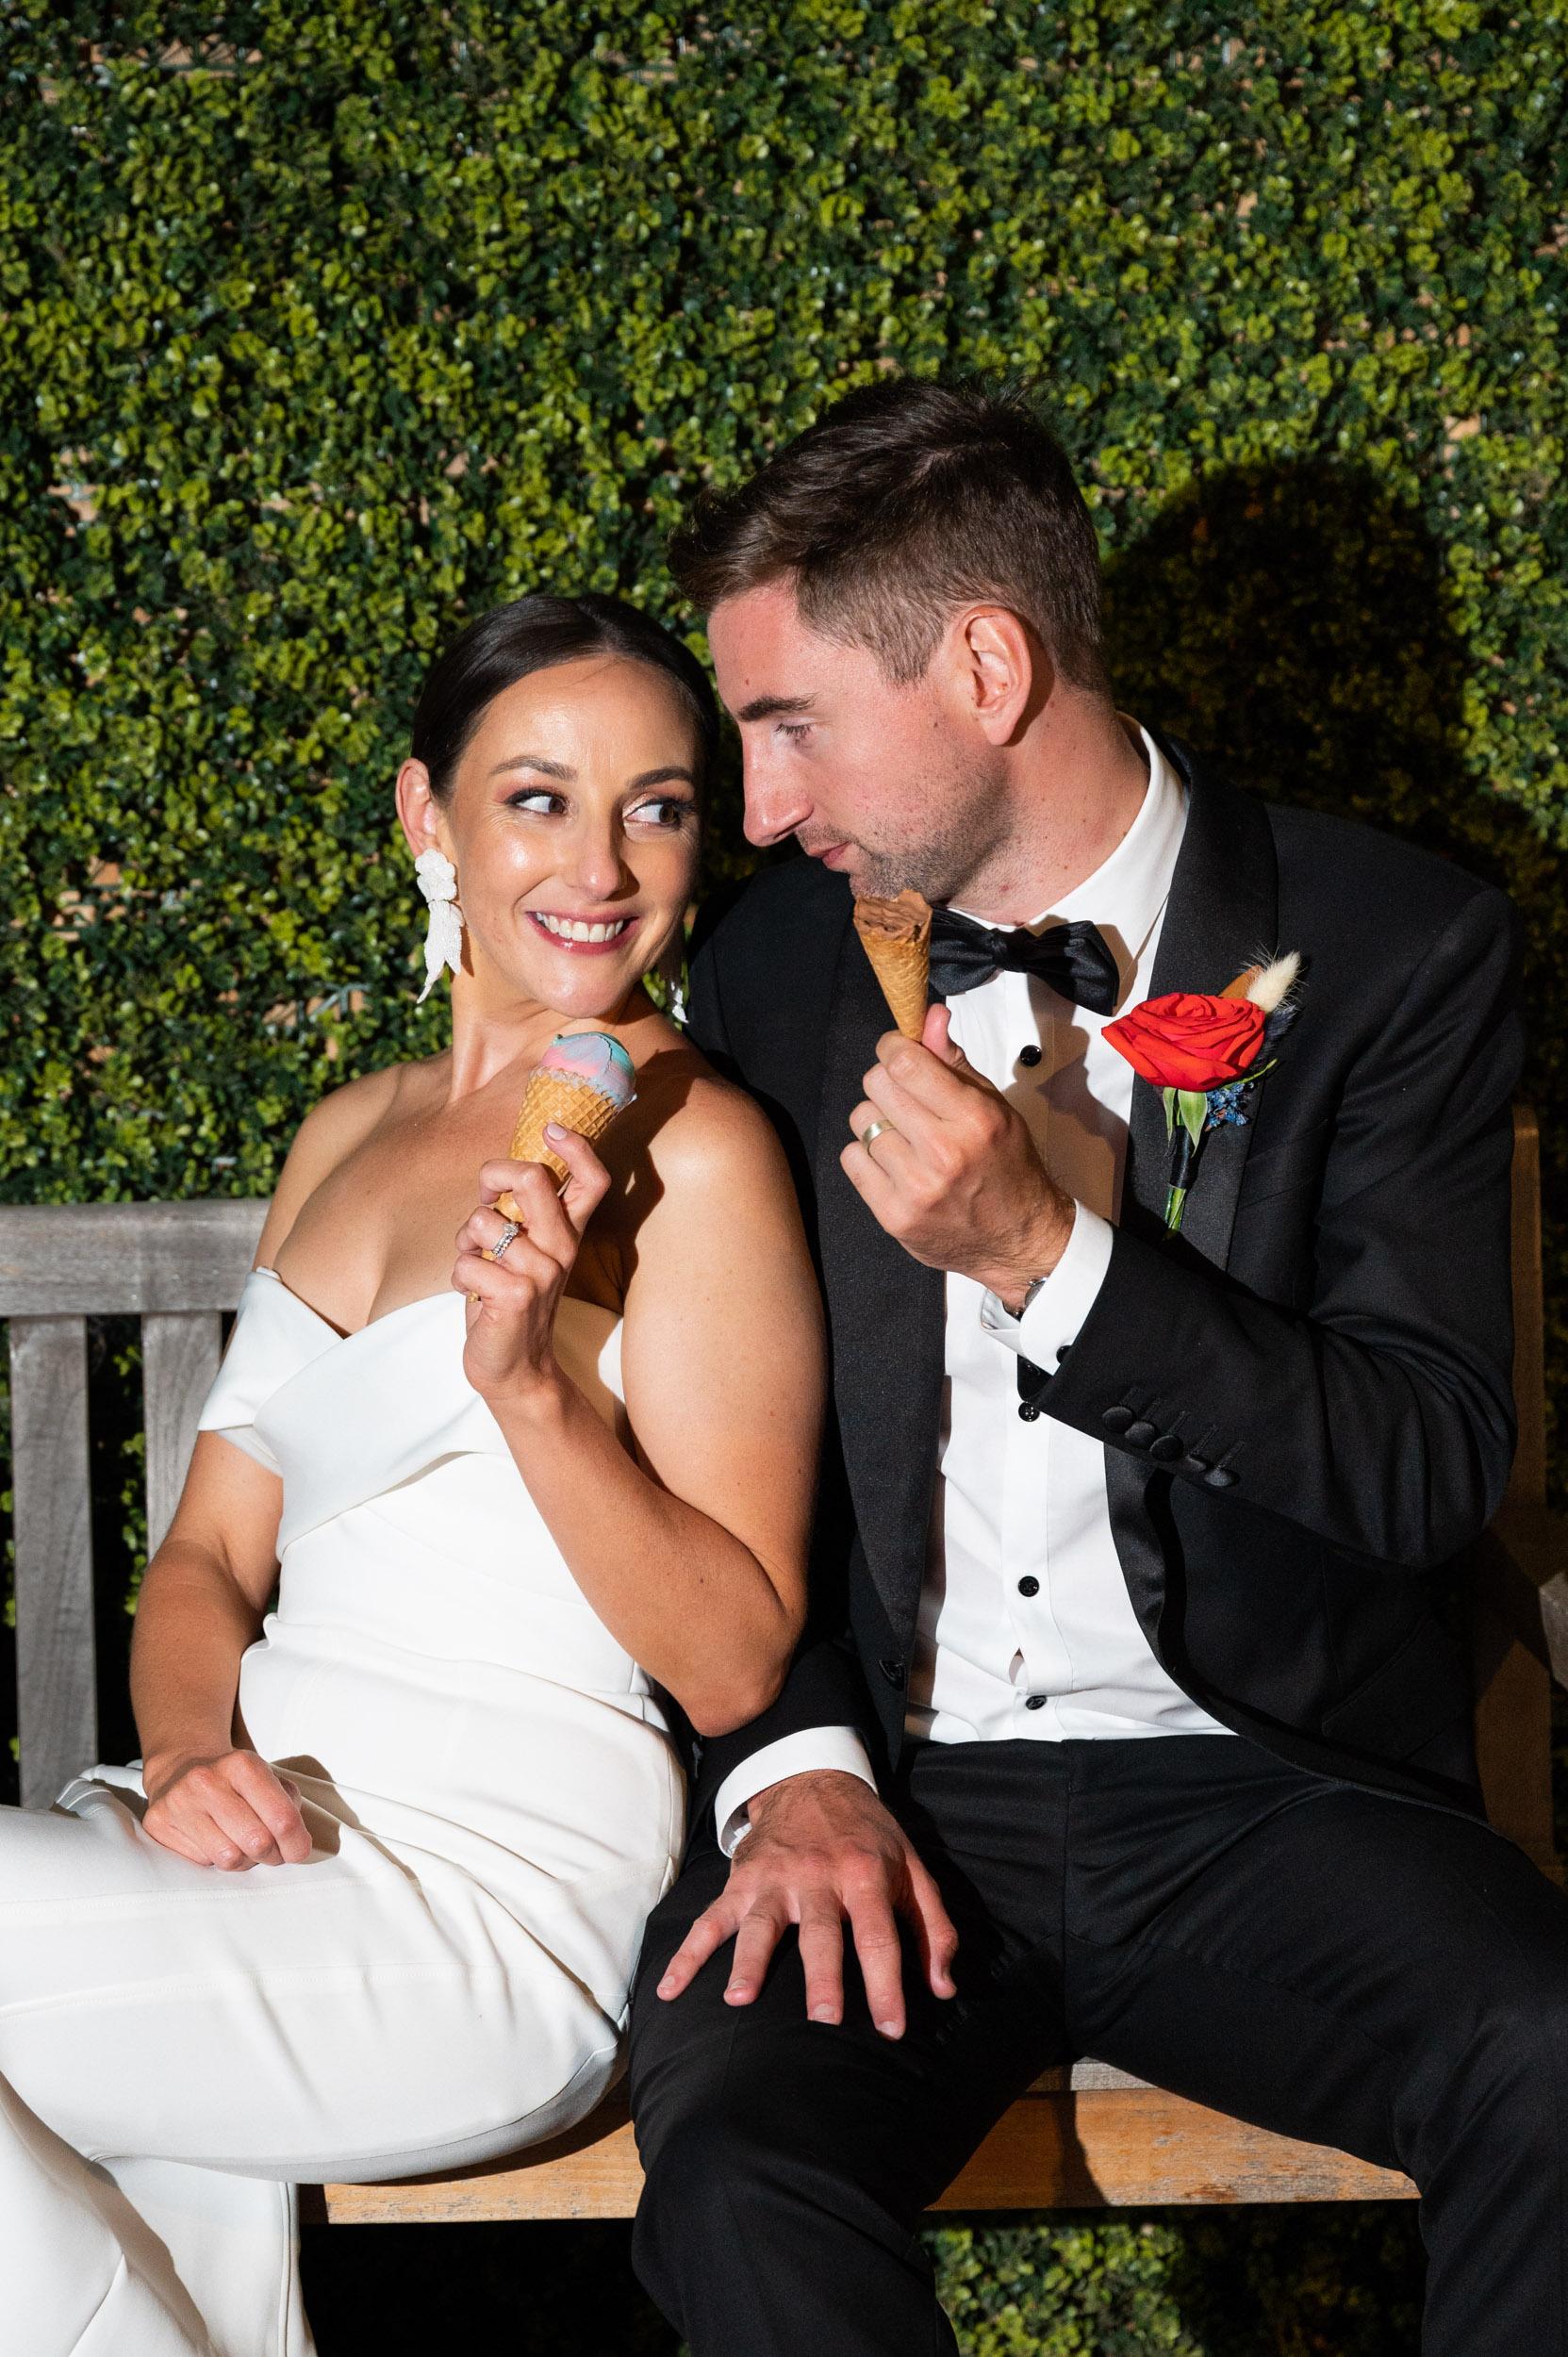 wedding, bride & groom, Melbourne Wedding, Ice cream